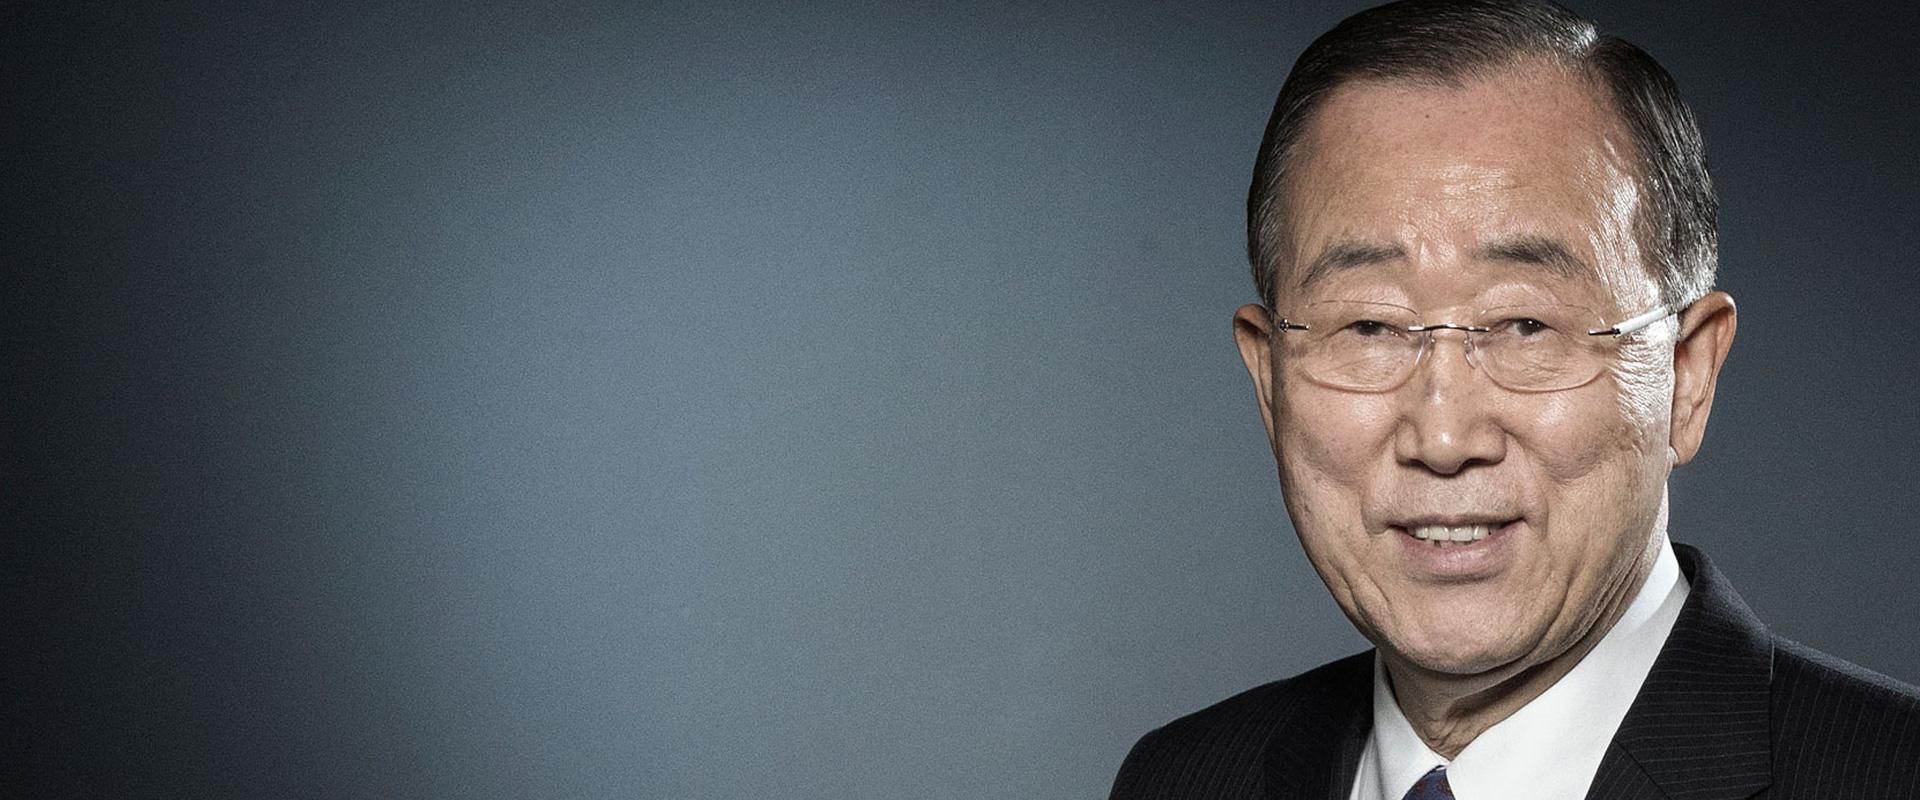 Ban Ki-moon | The Elders